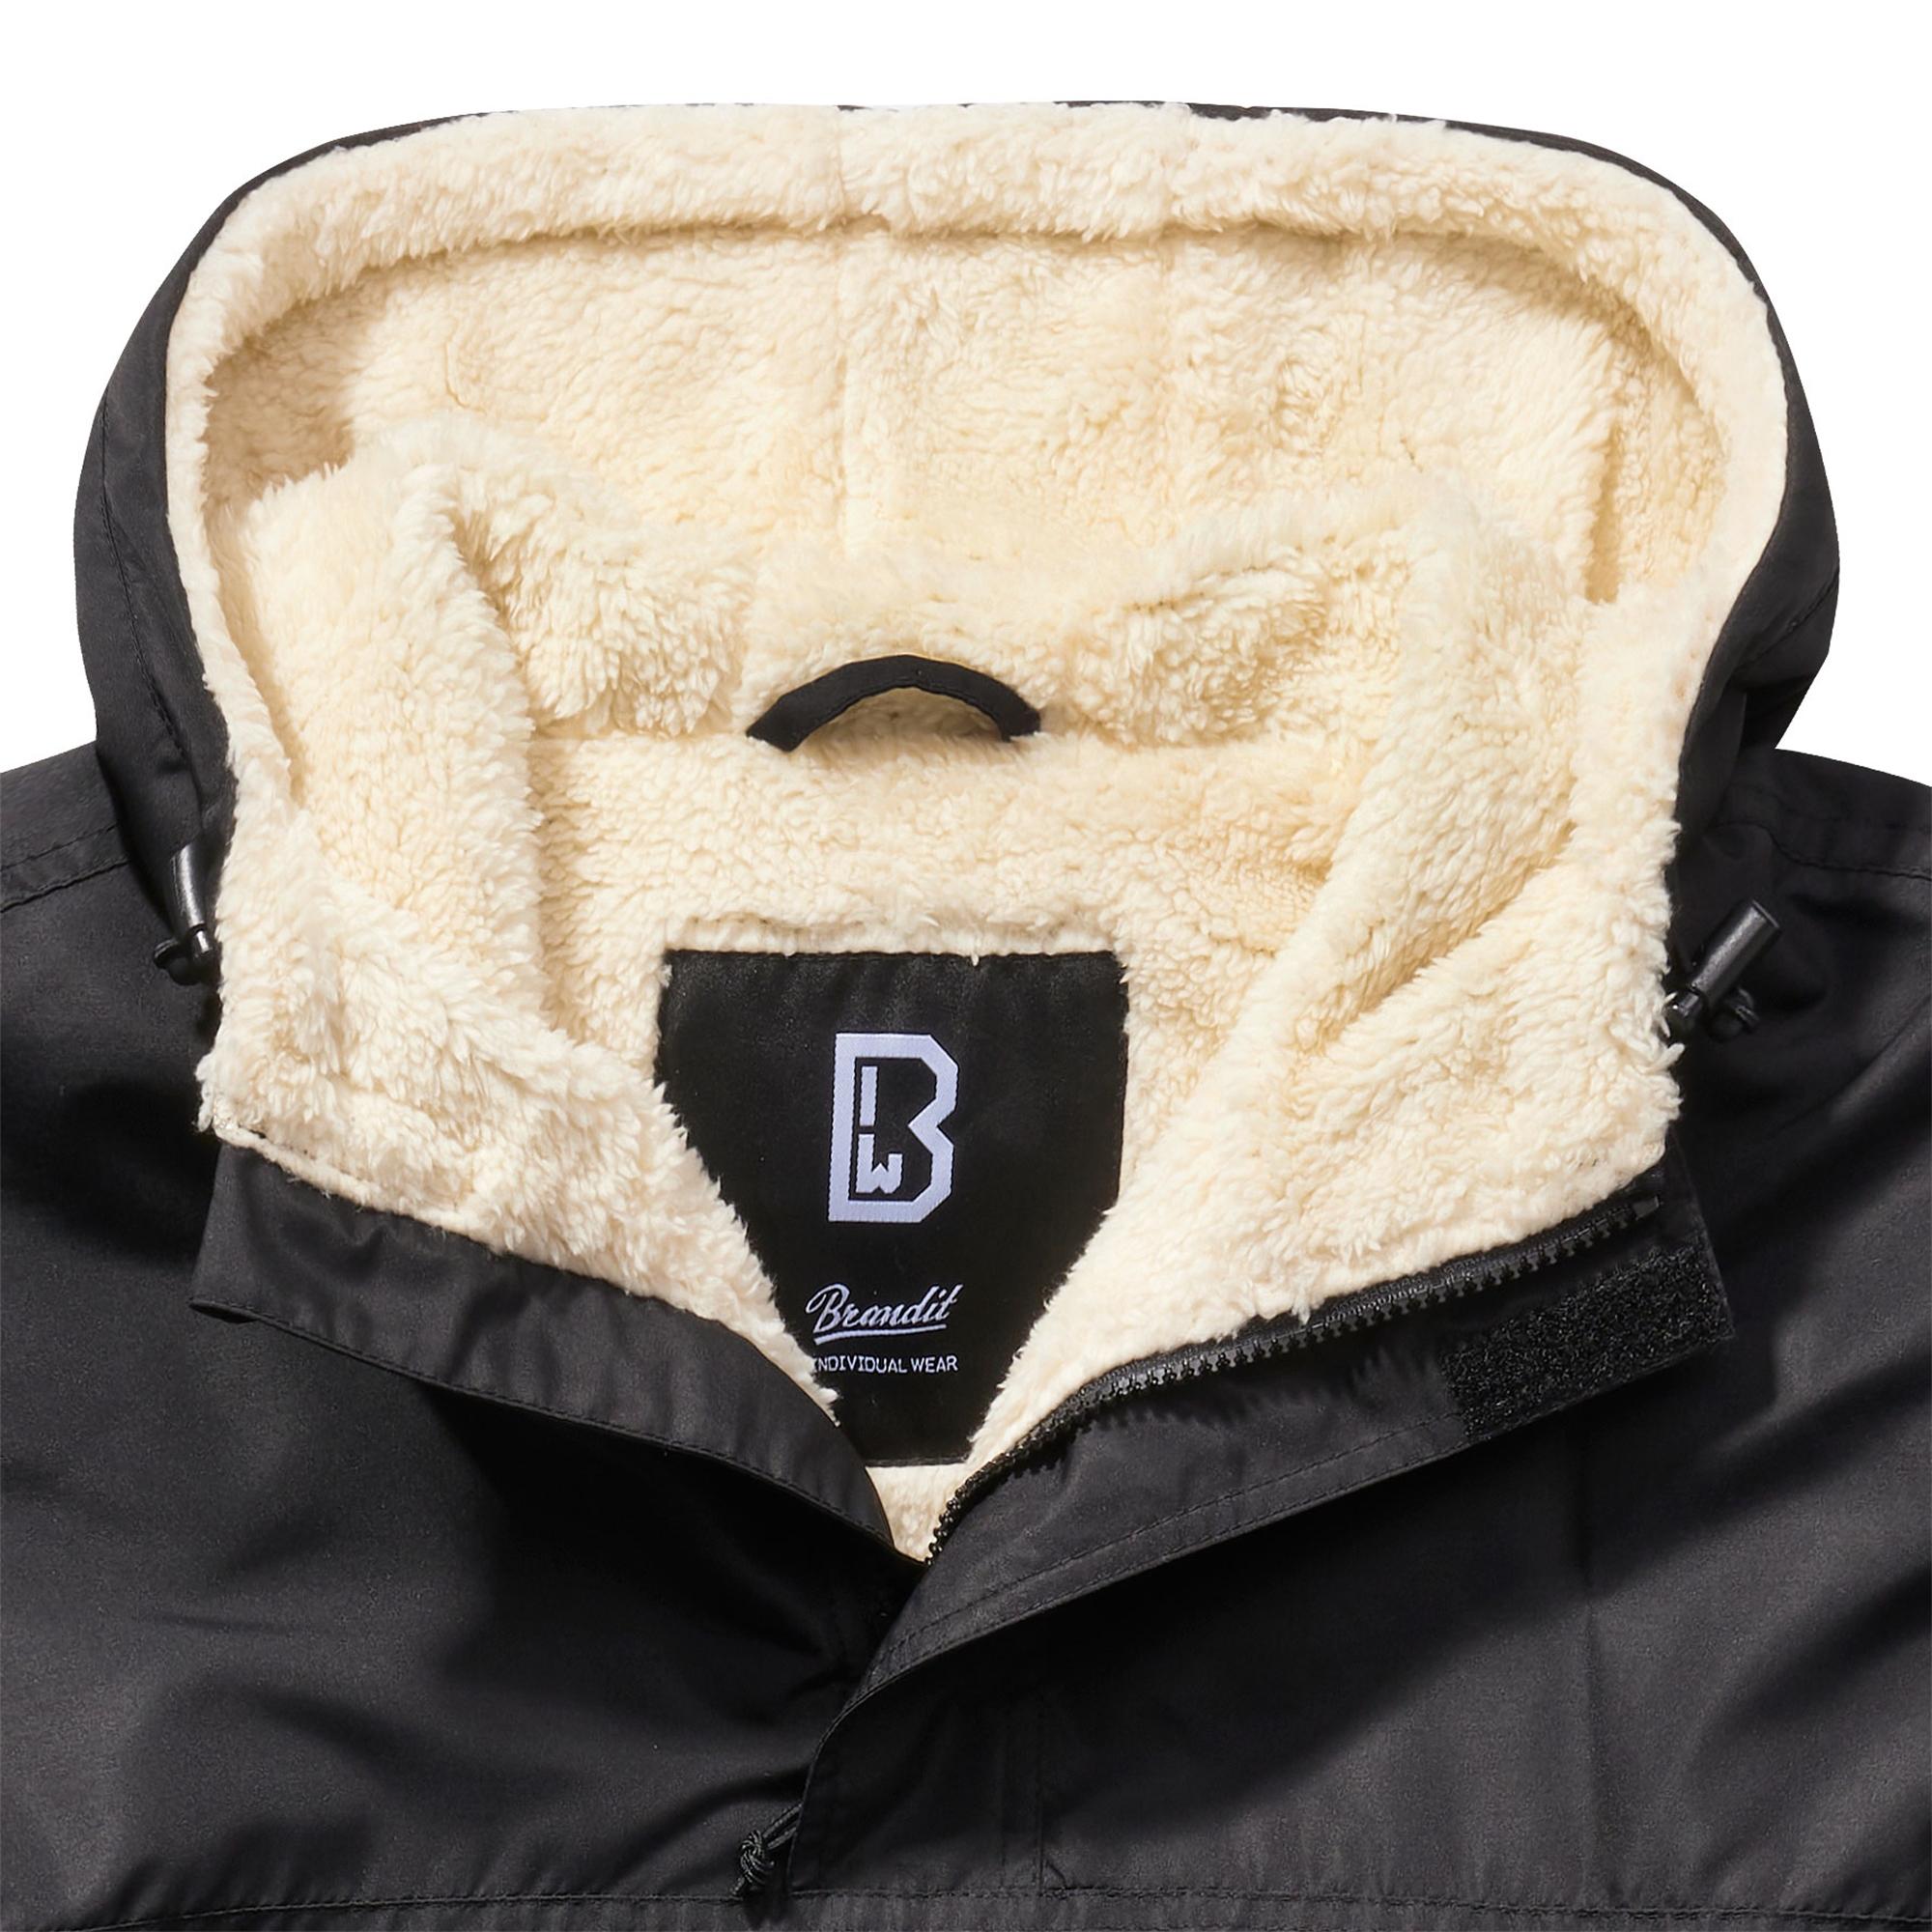 Brandit-Lumberjack-Kapuzen-Jacke-gefuettert-Holzfaellerhemd-Winterjacke-S-5XL Indexbild 5